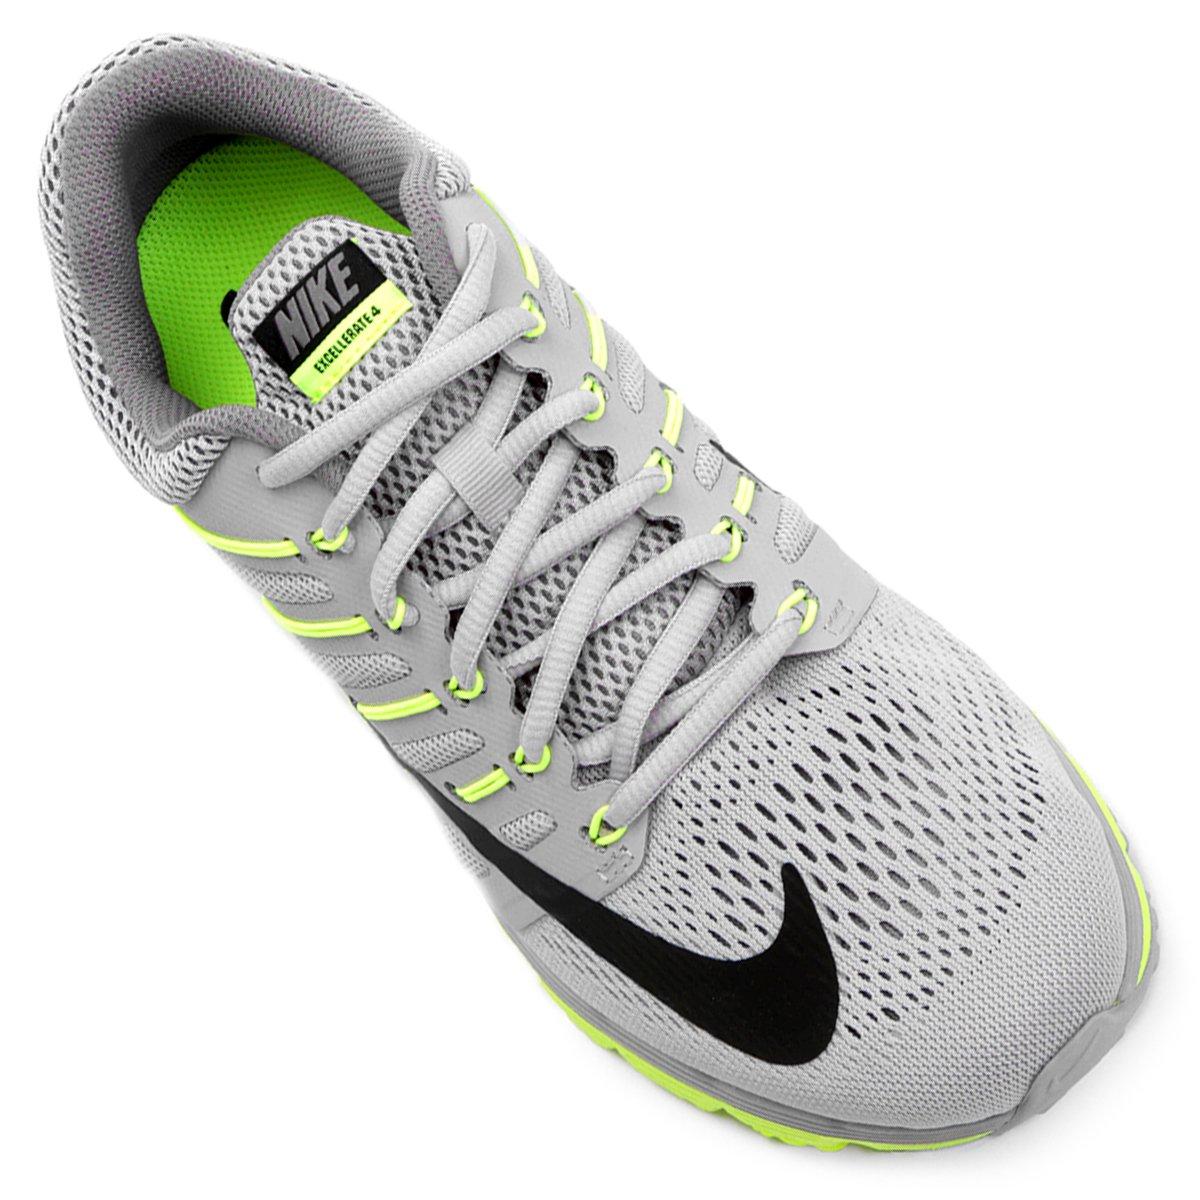 a19d613963b ... new zealand flywire feminino tênis nike air max excellerate 4 feminino  cinza e verde li tenis ...